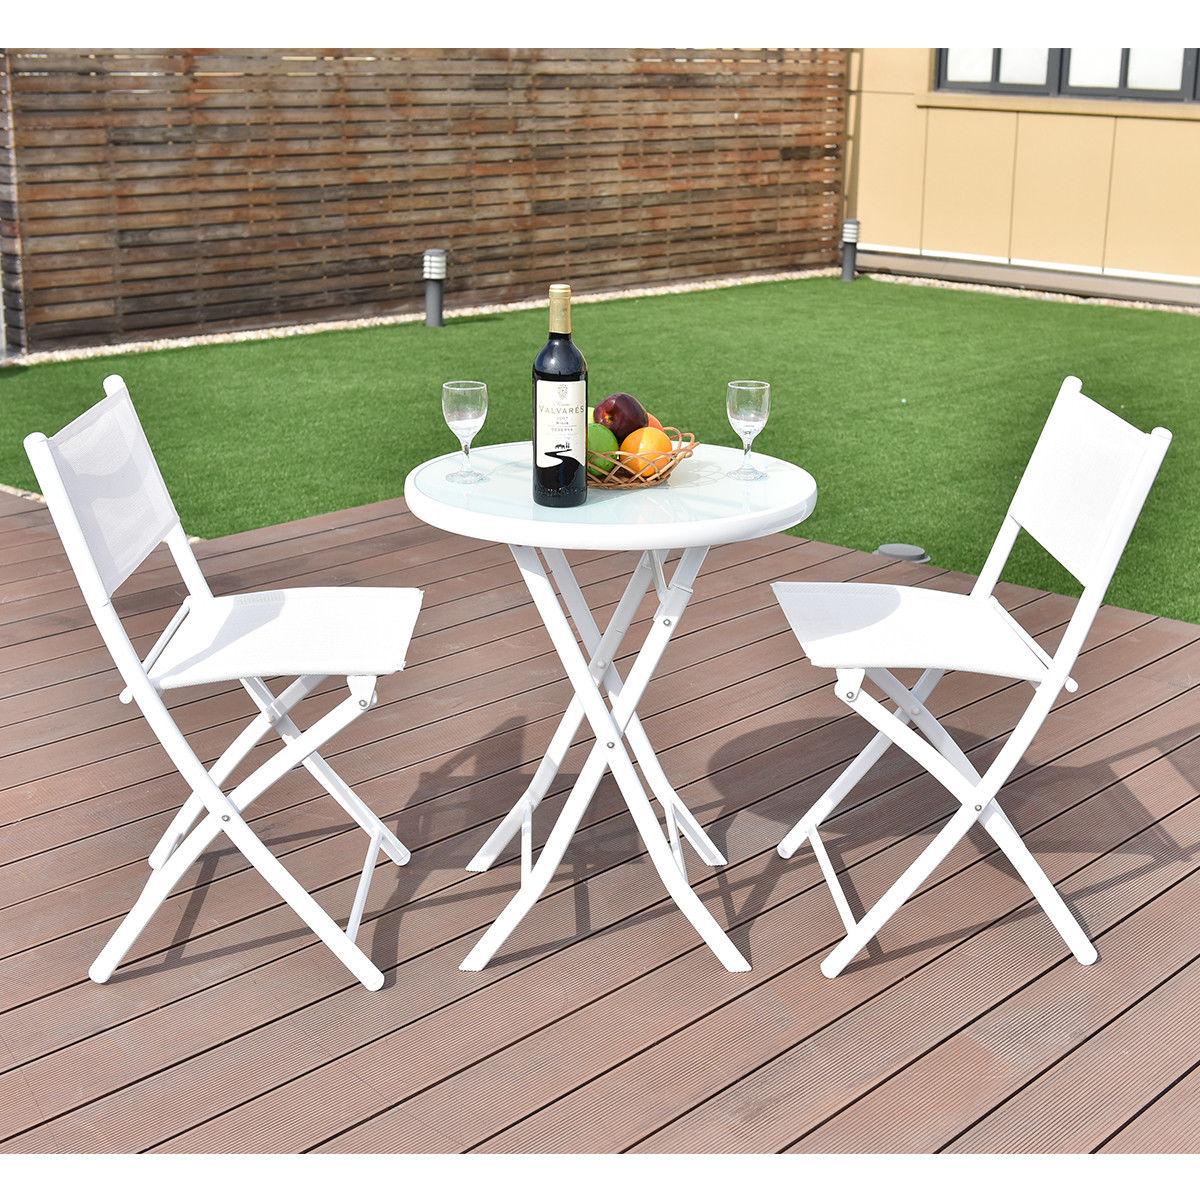 costway 3 pcs folding bistro table chairs set garden backyard patio furniture white